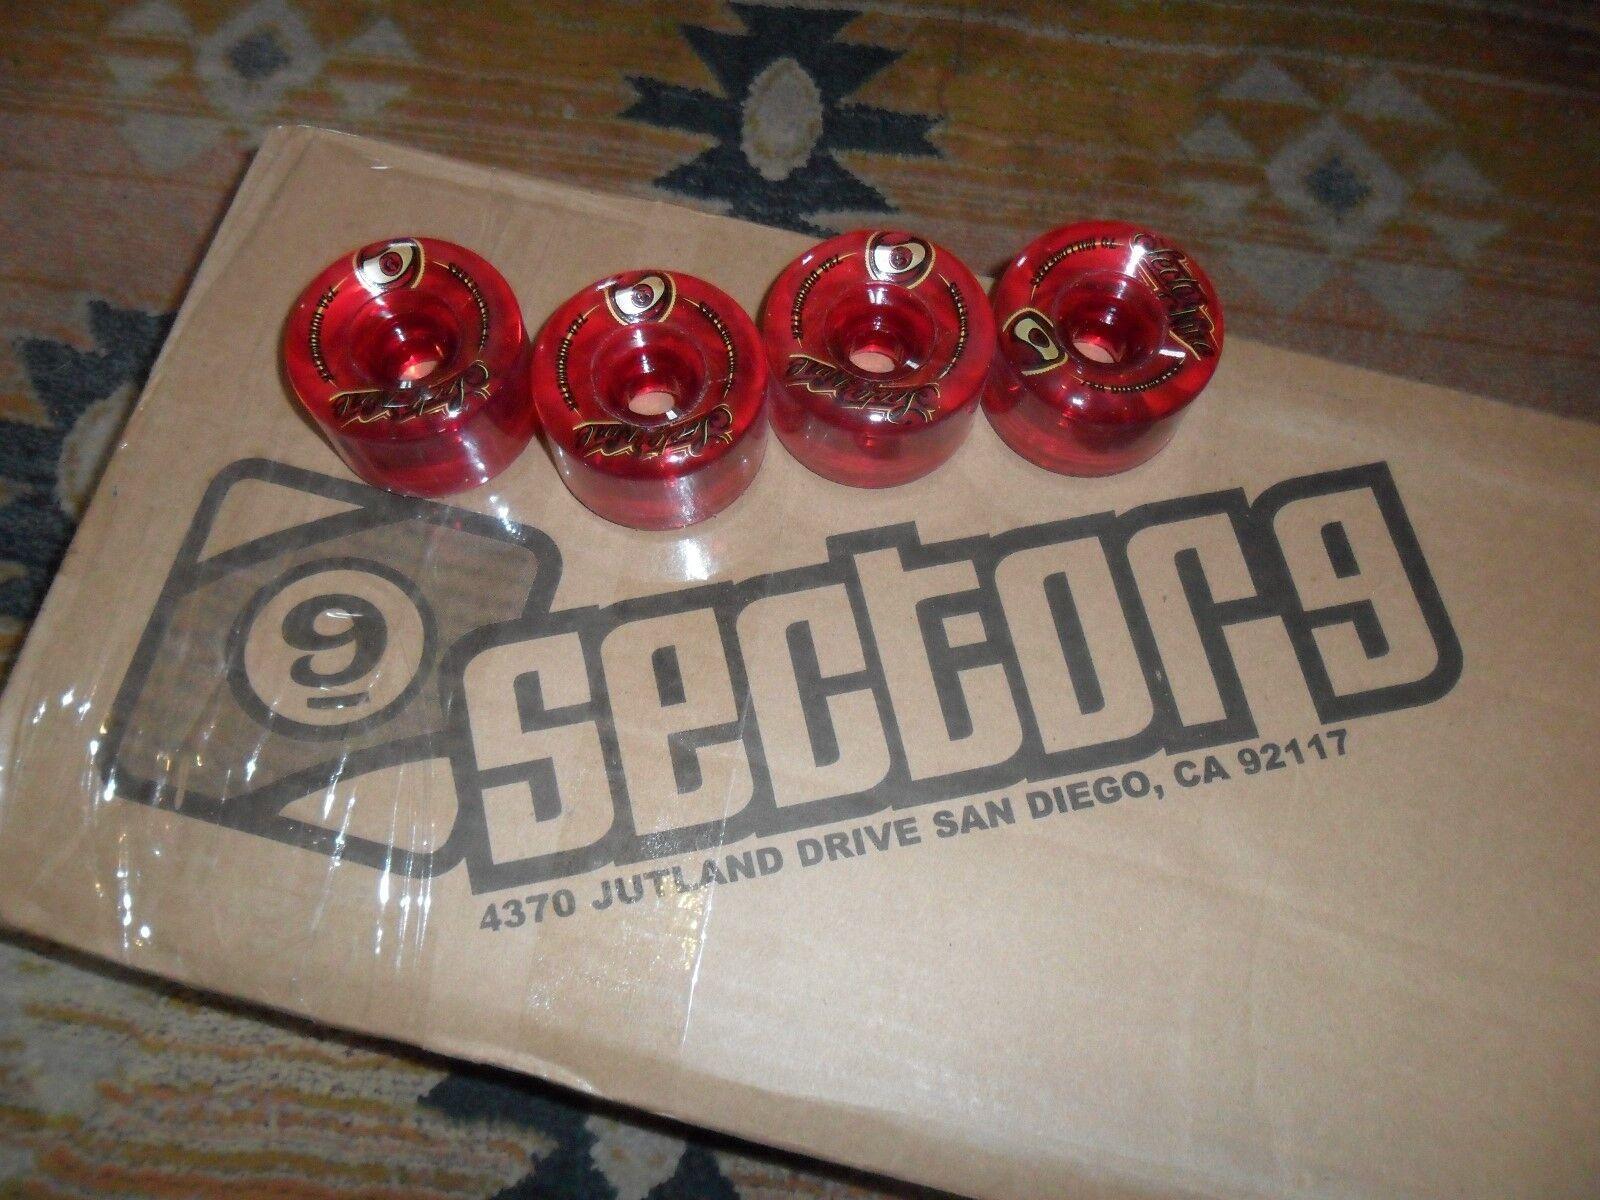 BRAND NEW QUALITY SECTOR 9 top shelf 9 balls LONGBOARD CRUISER WHEELS 70 X 45MM